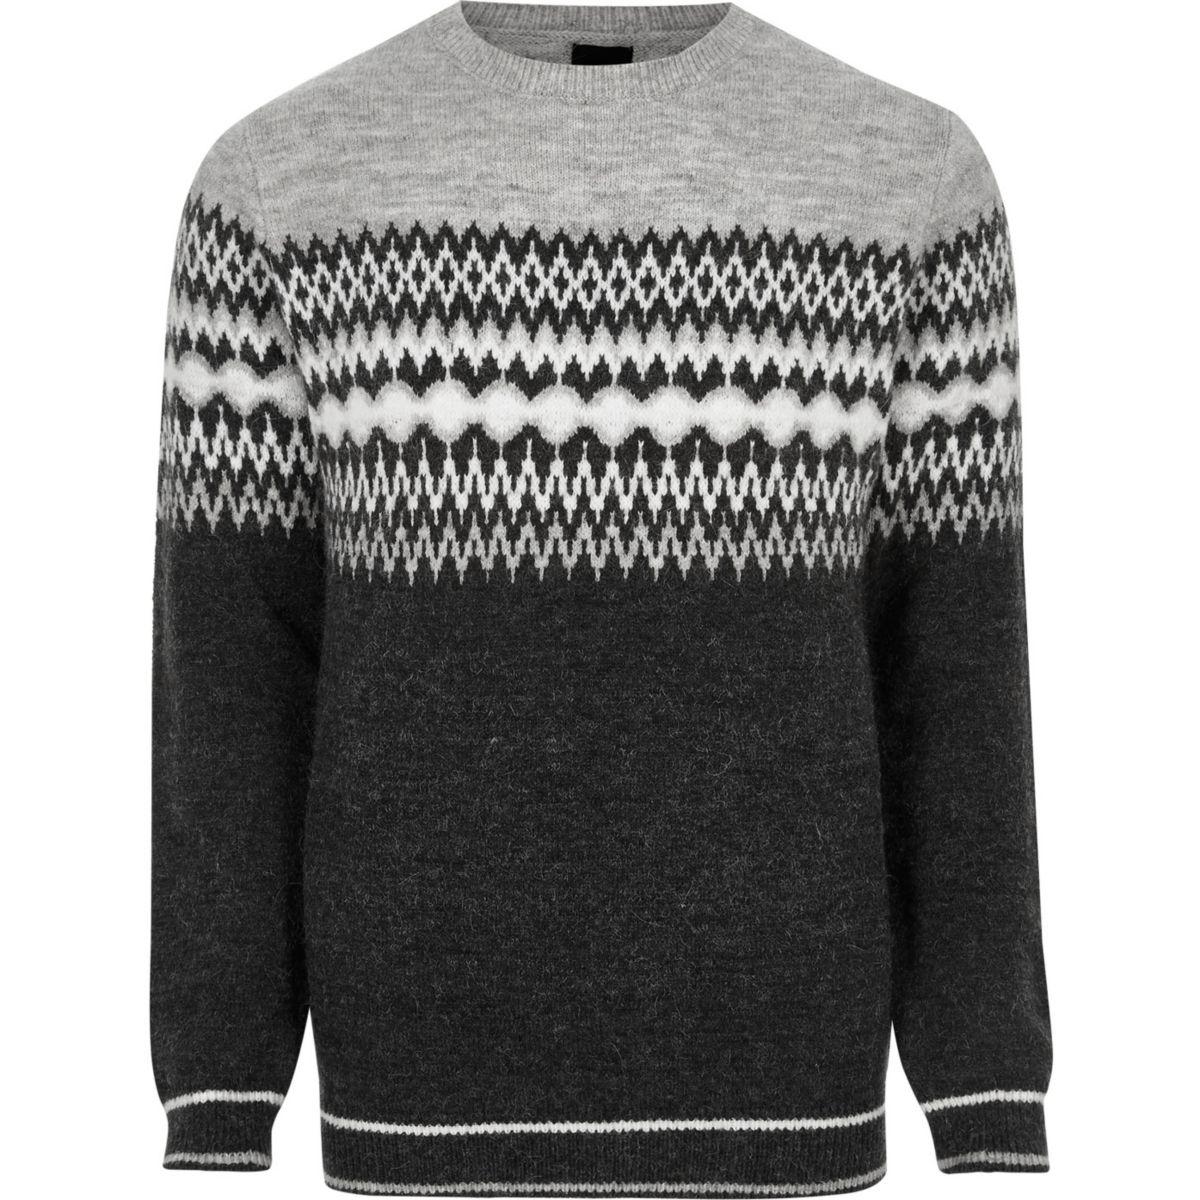 Grey Fairisle block knit Christmas sweater